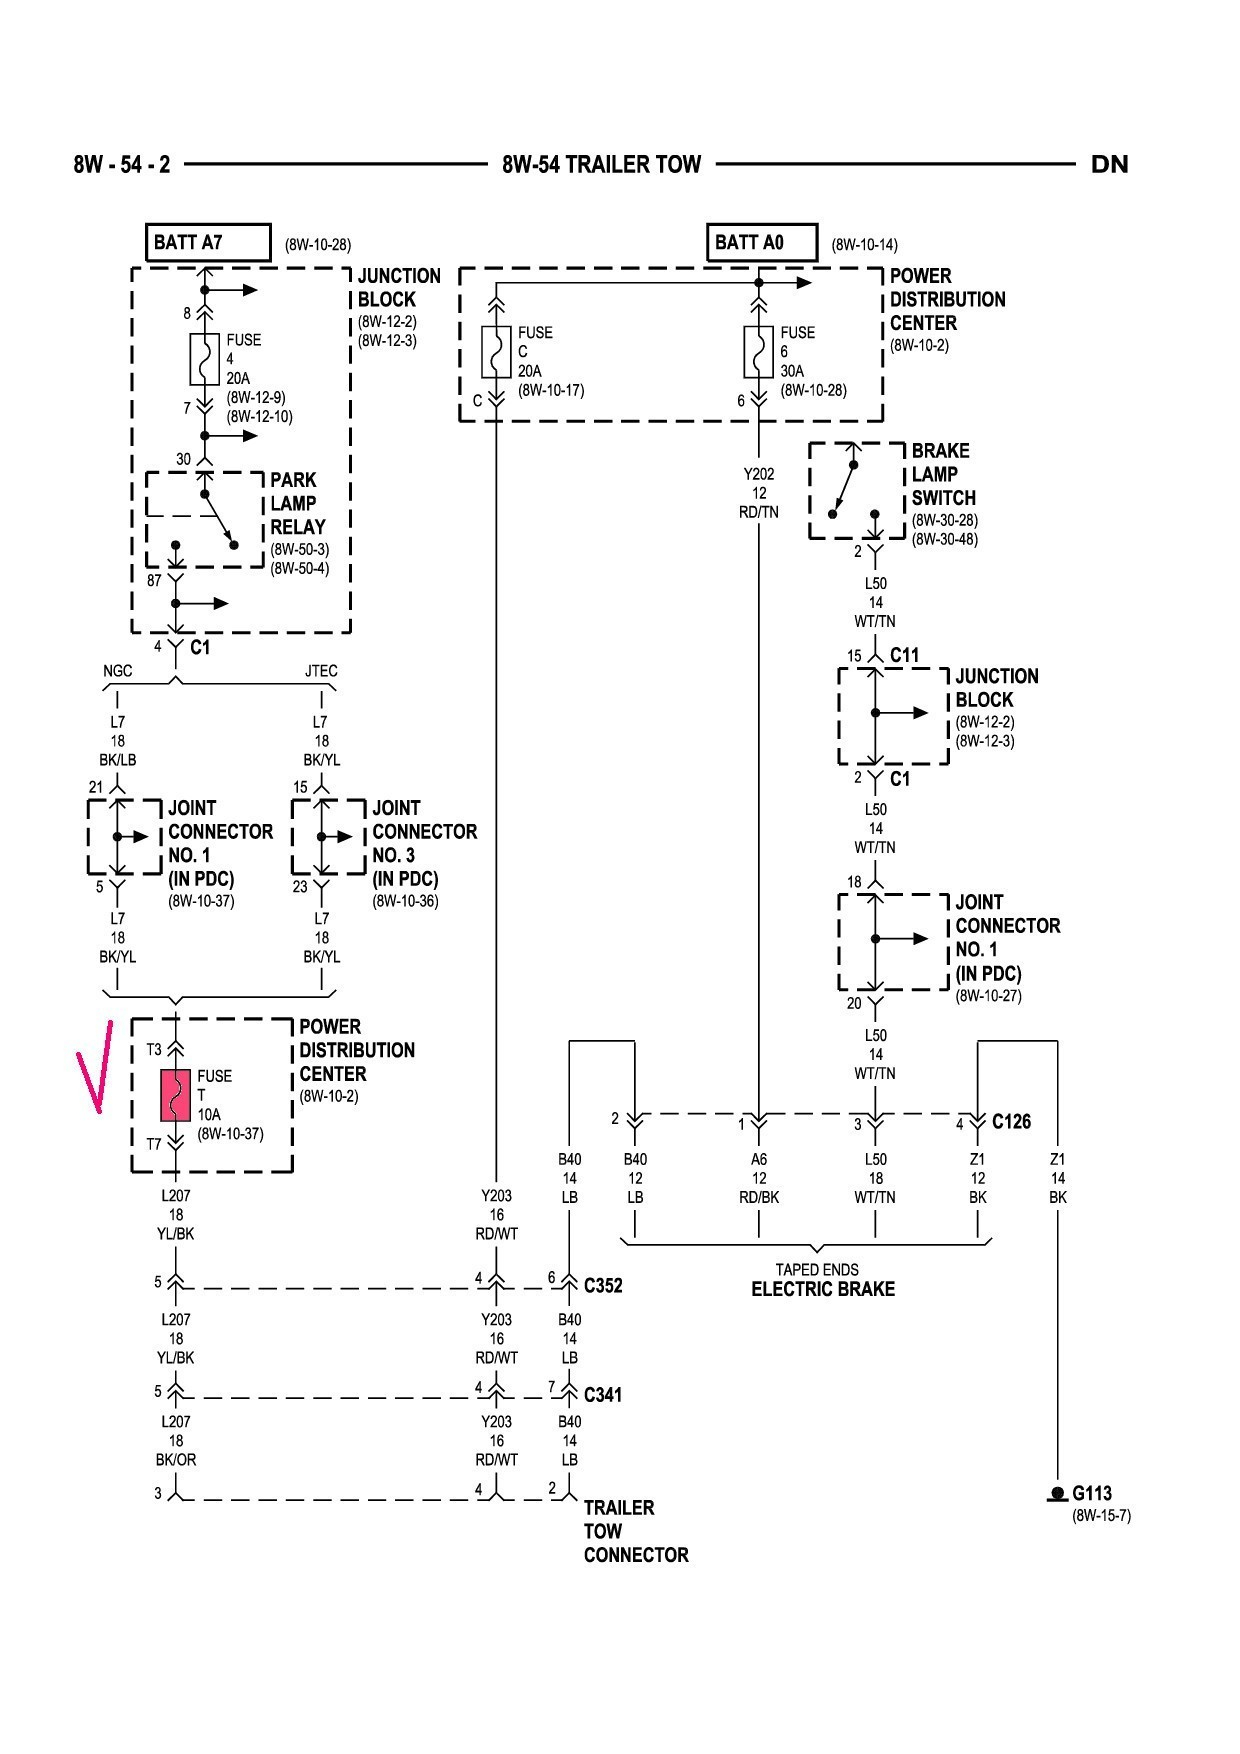 2001 dodge trailer wiring diagram phone socket australia dakota collection for durango valid